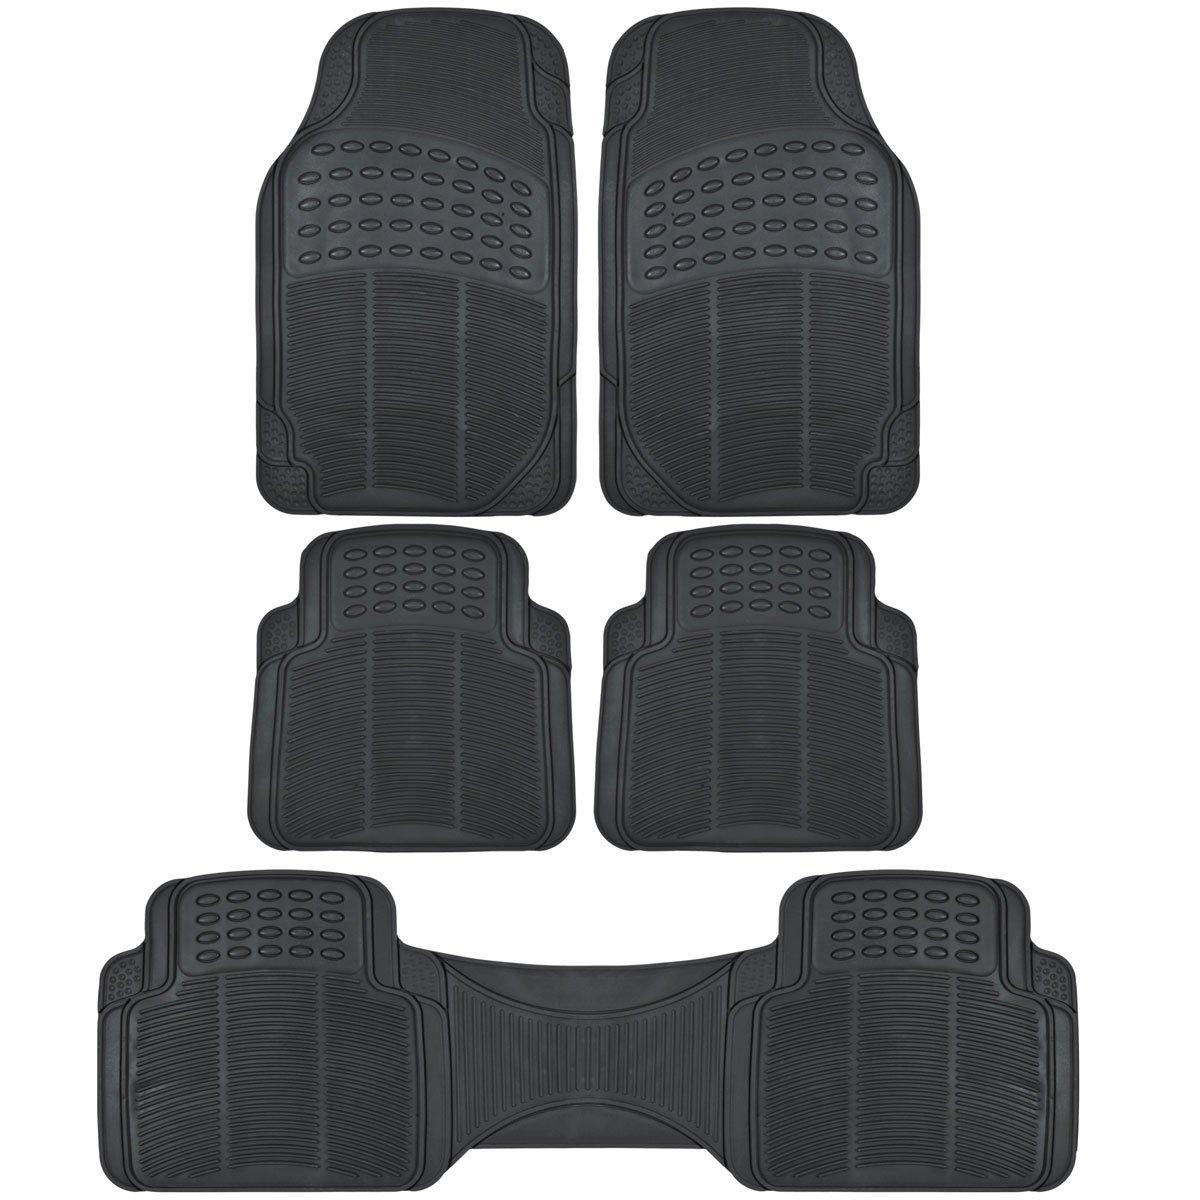 All Weather Black Vinyl Non-slip Trimmable Truck SUV Van Floor Mats 5 pcs